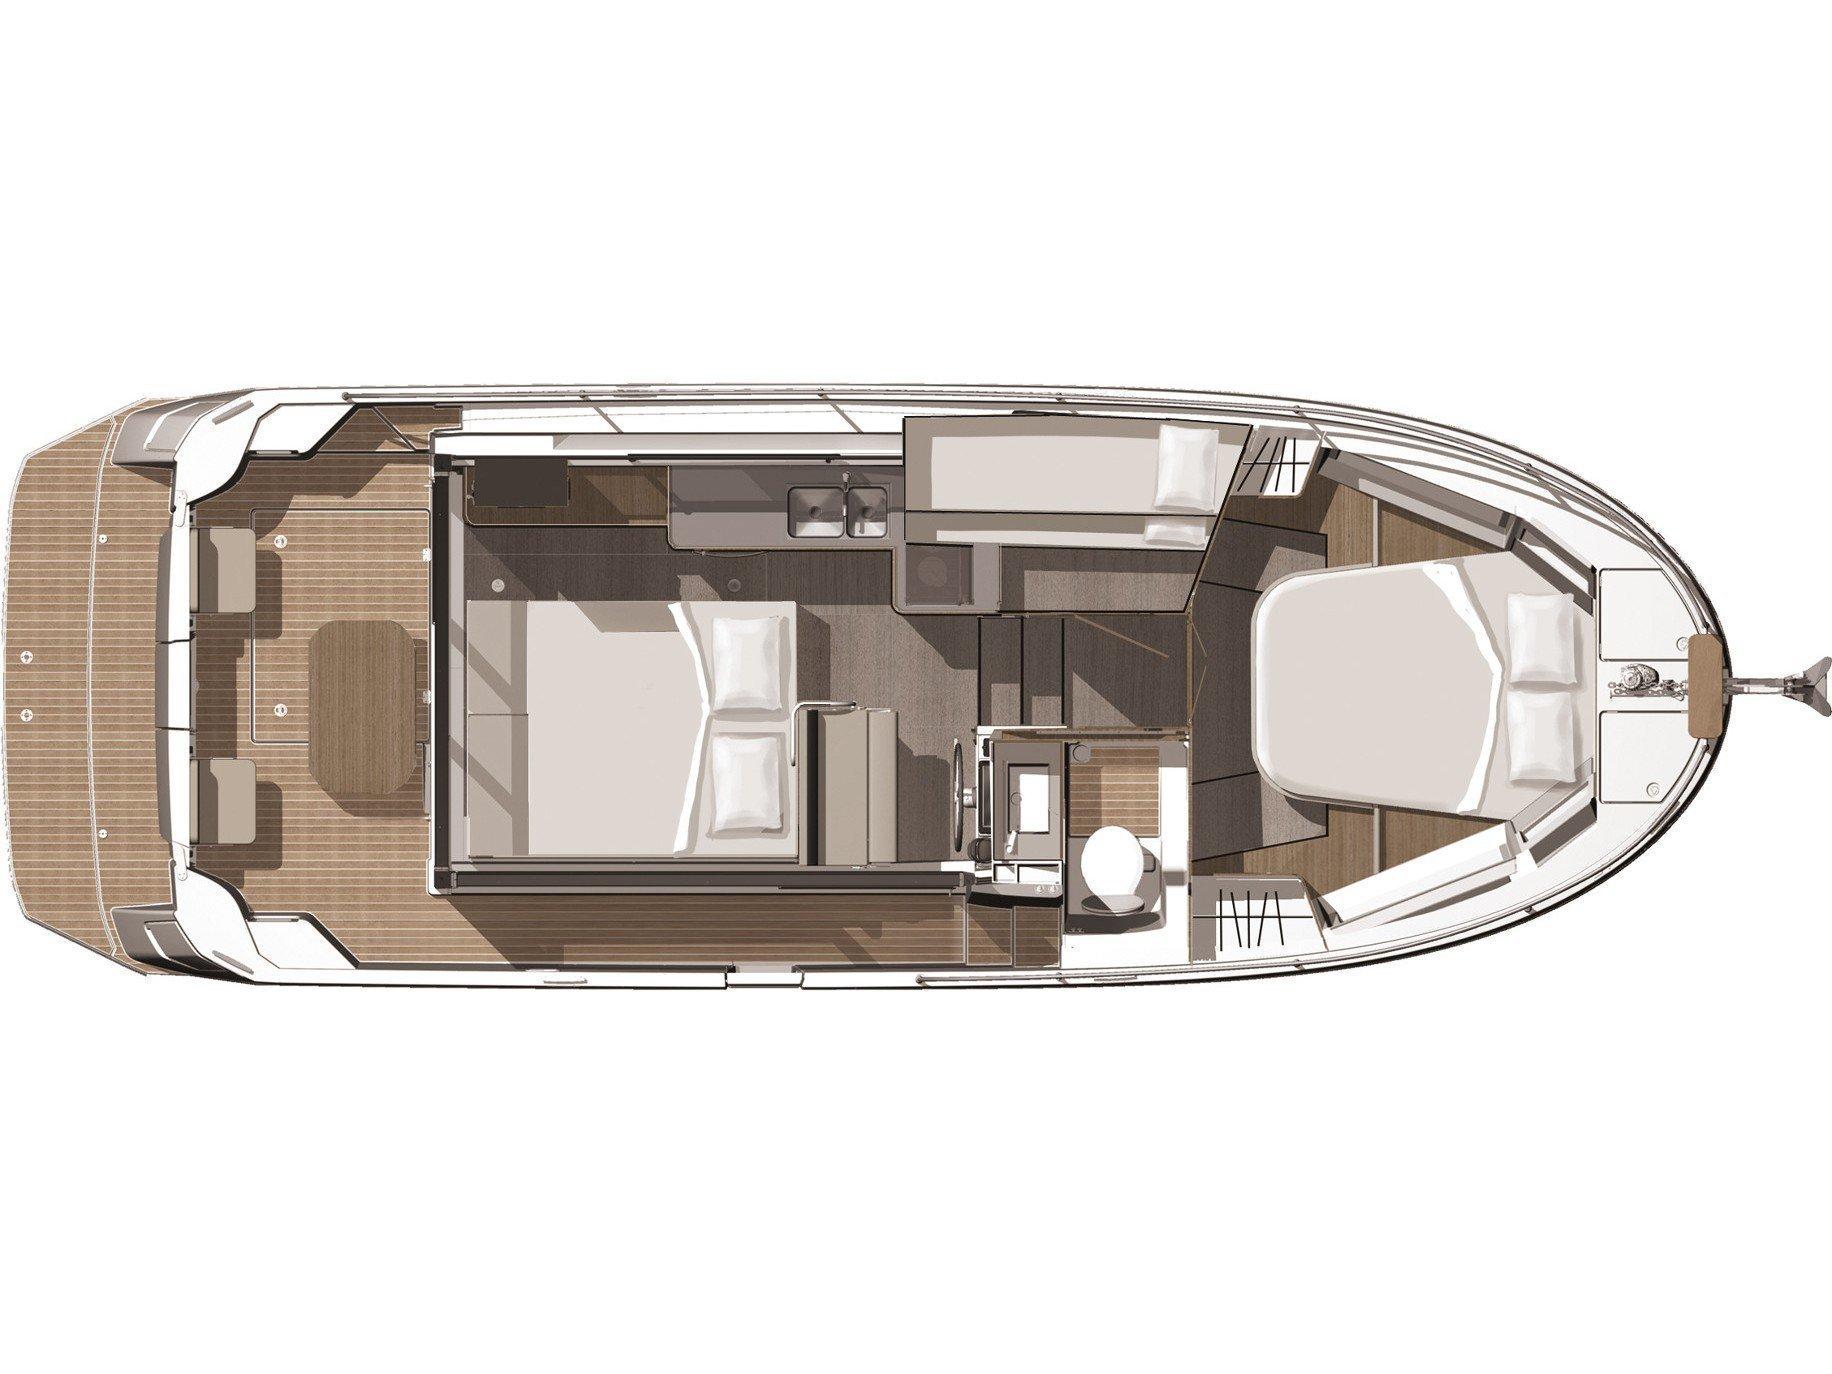 Beneteau Swift Trawler 30 (Odysseus) Plan image - 24